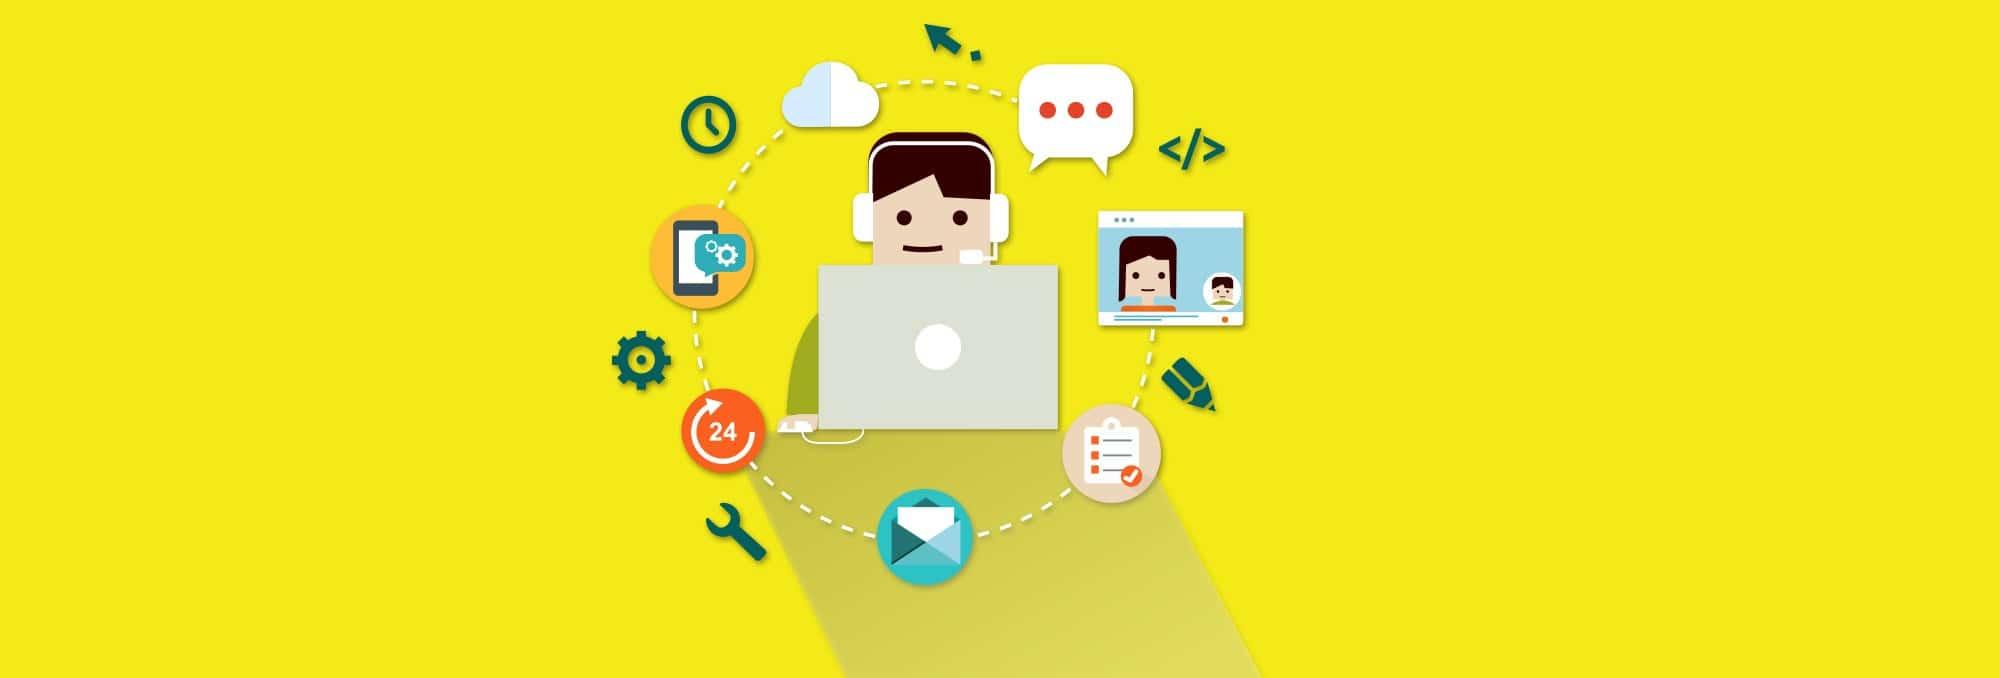 central alberta web development design website cms